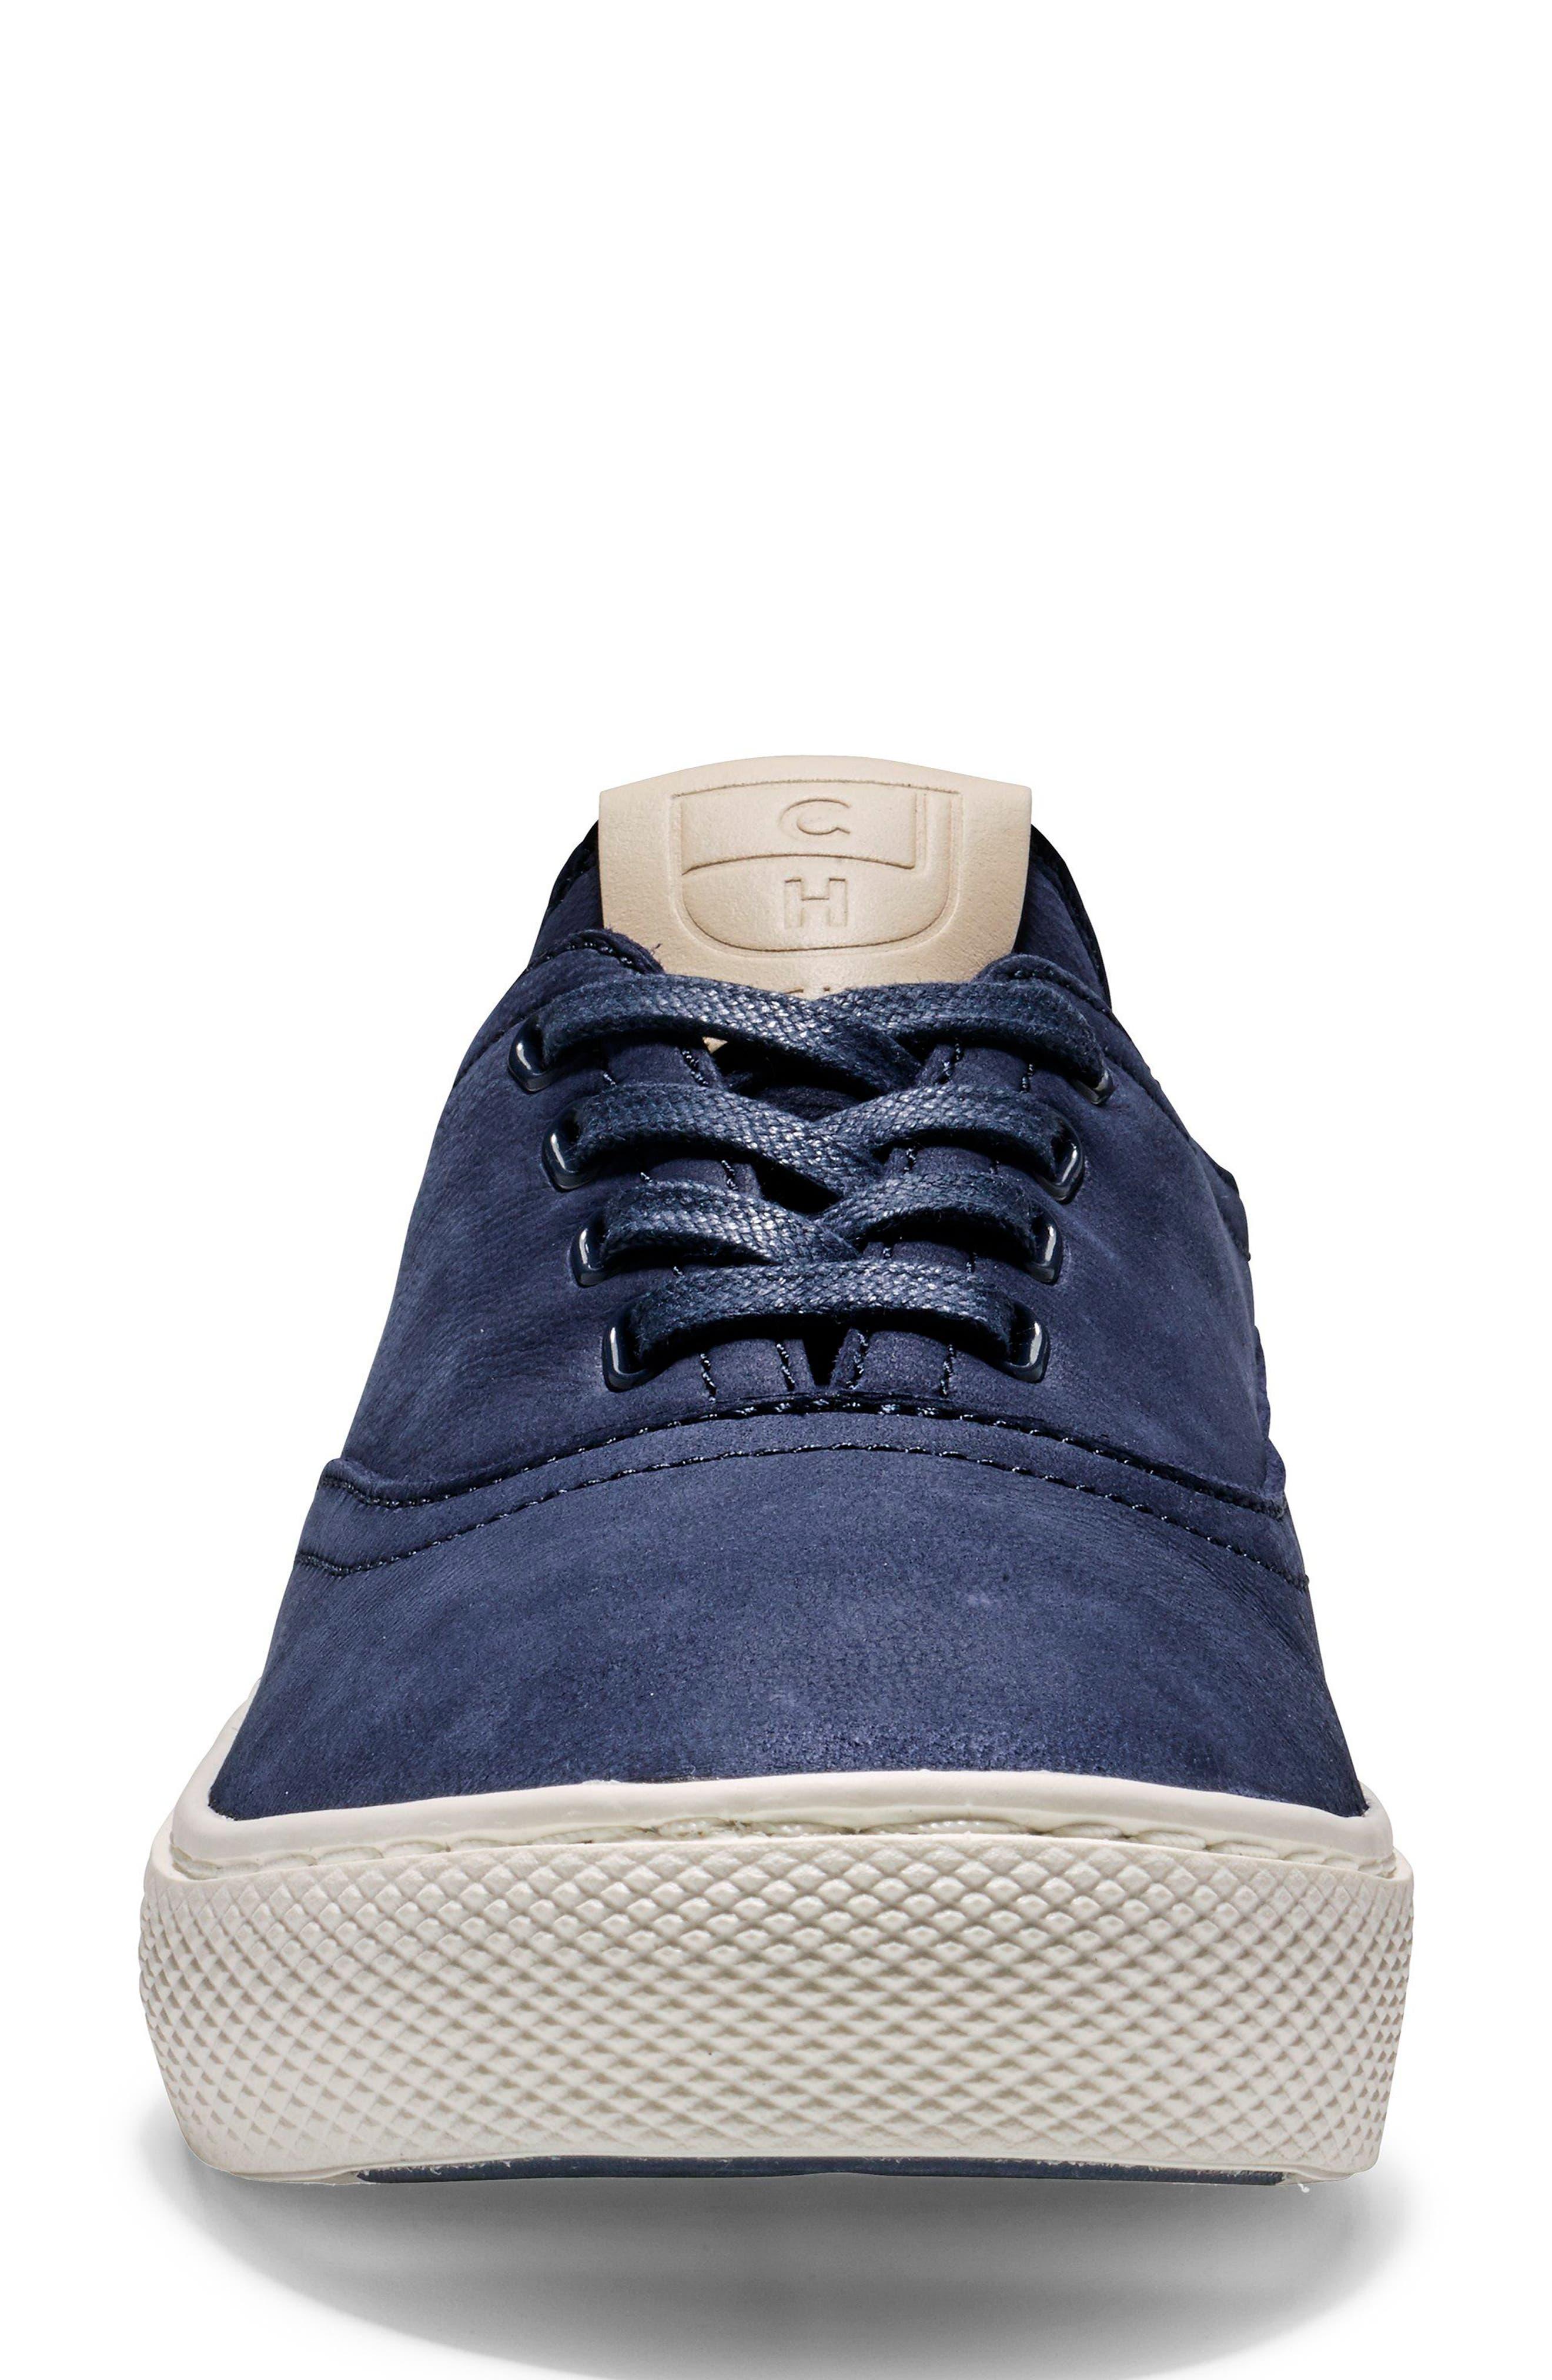 GrandPro Deck Sneaker,                             Alternate thumbnail 4, color,                             Blue/ White Nubuck